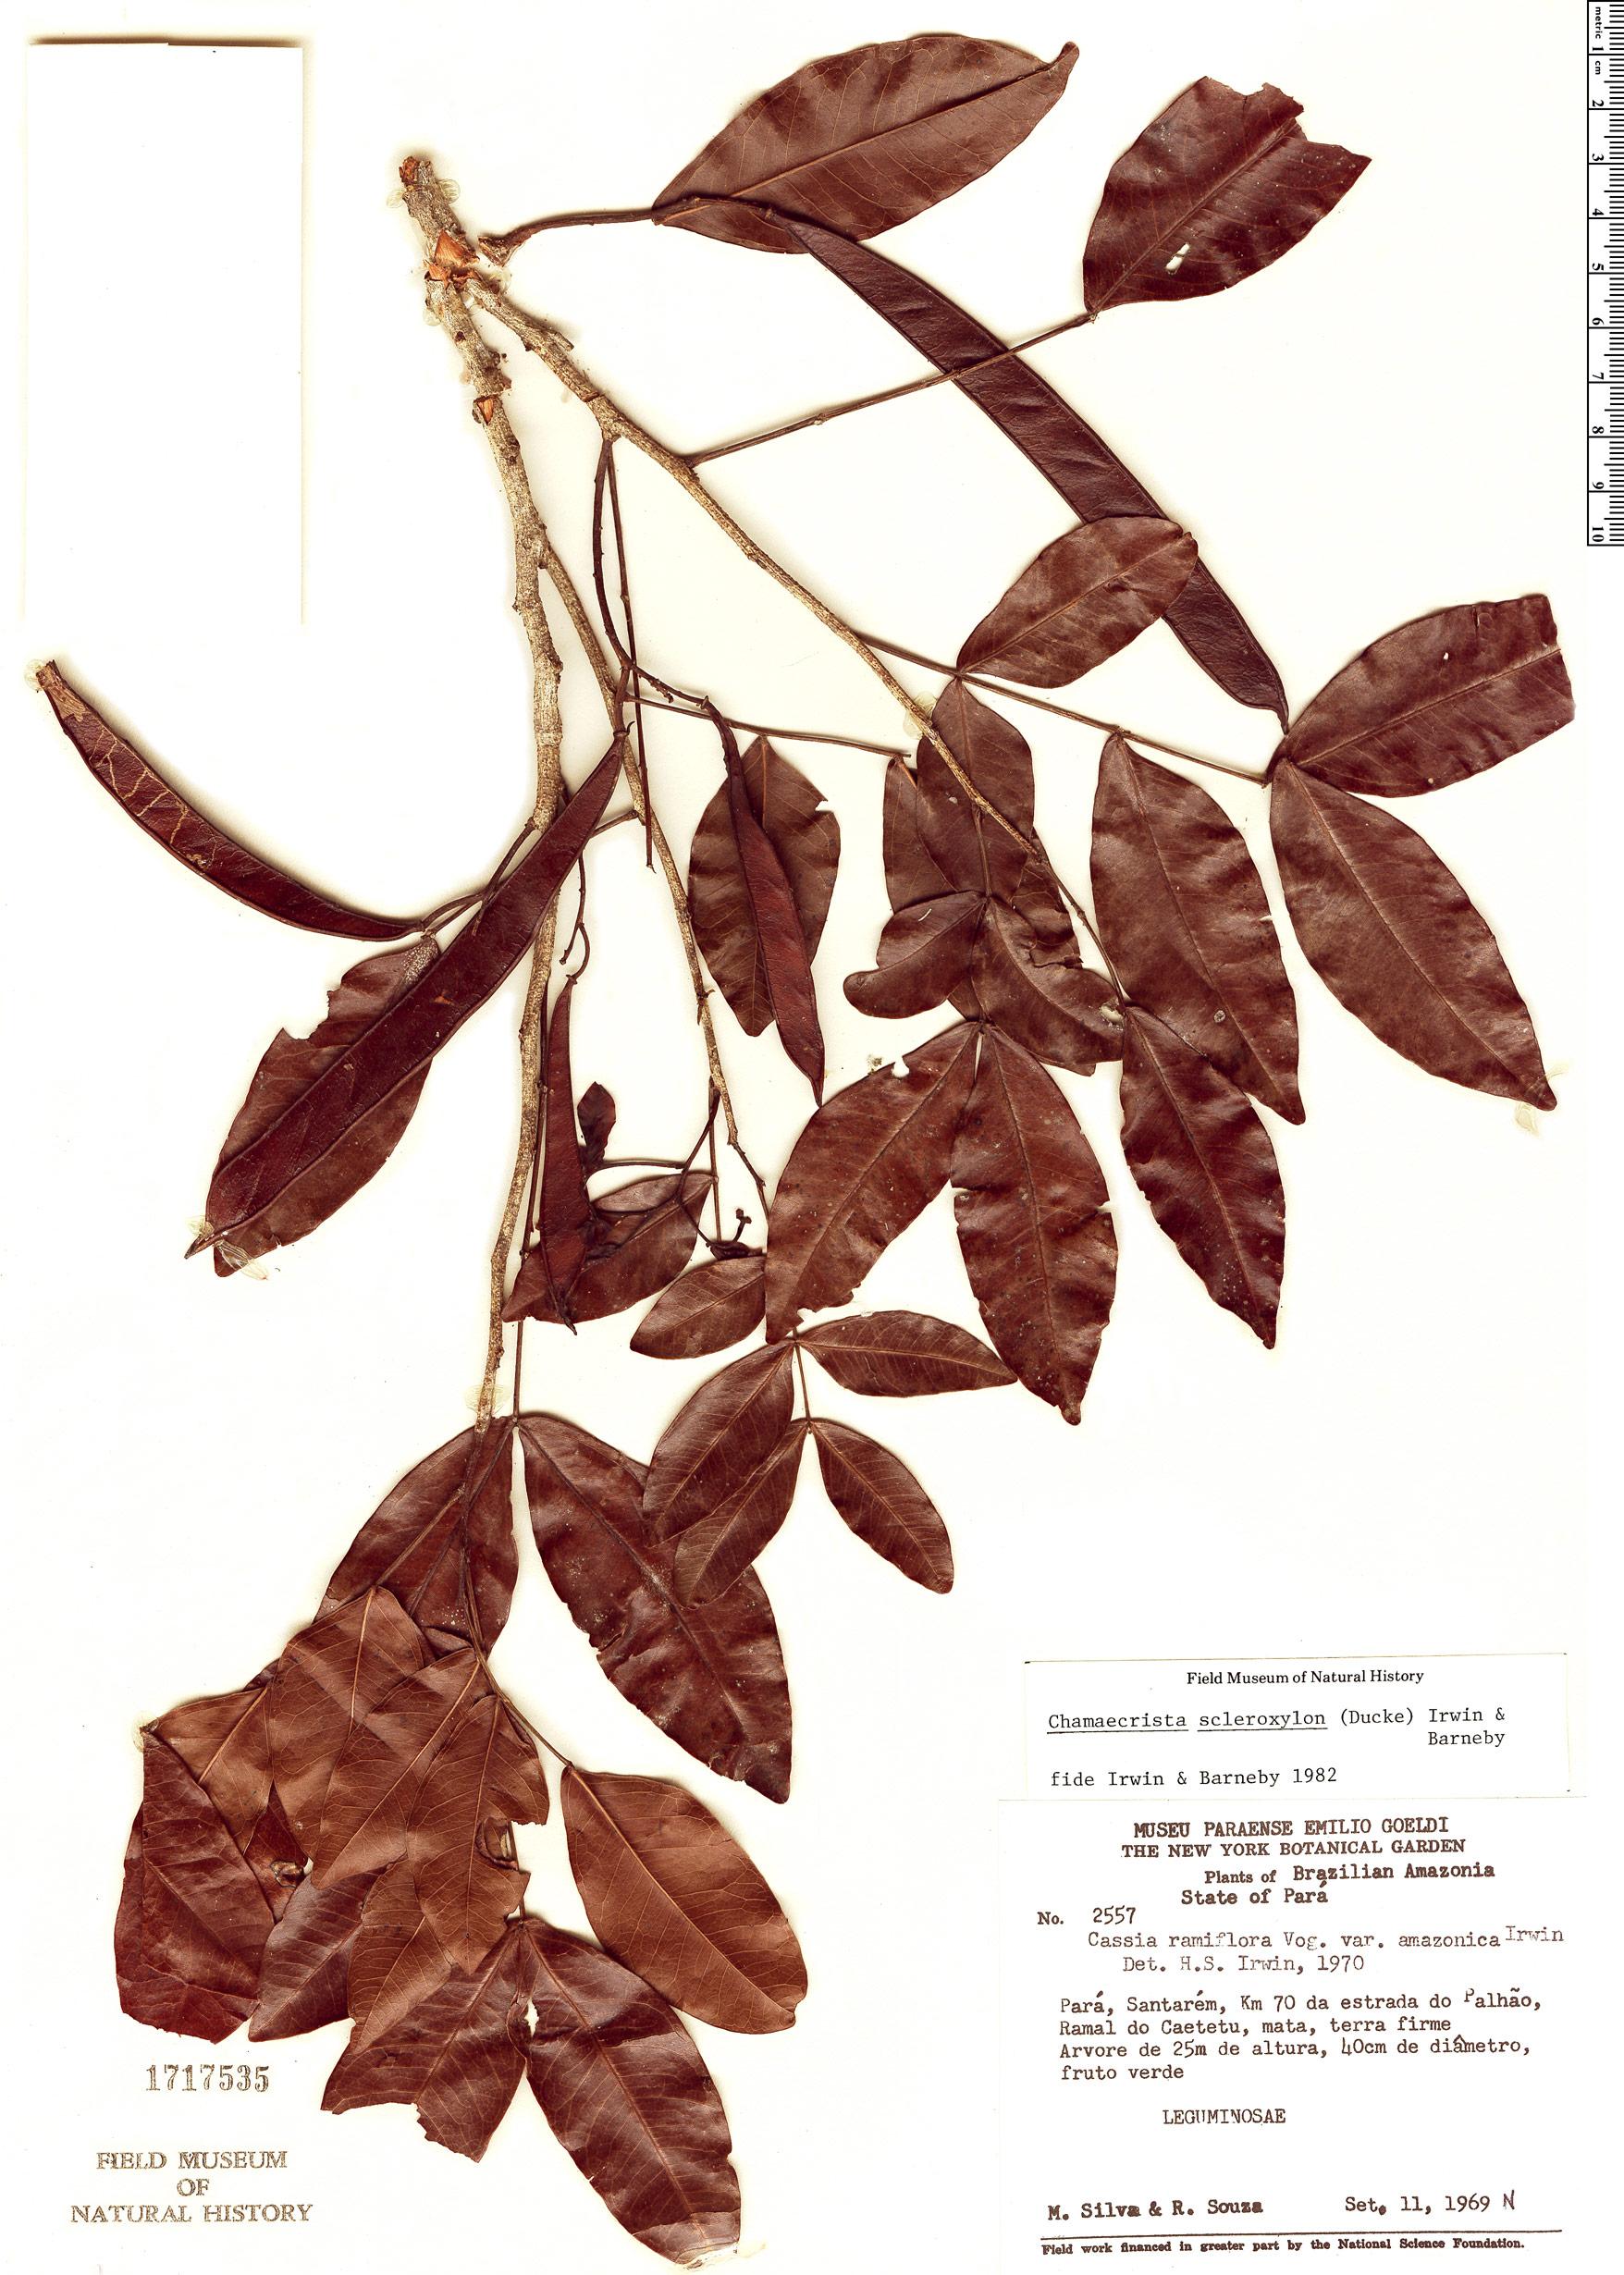 Specimen: Chamaecrista scleroxylon